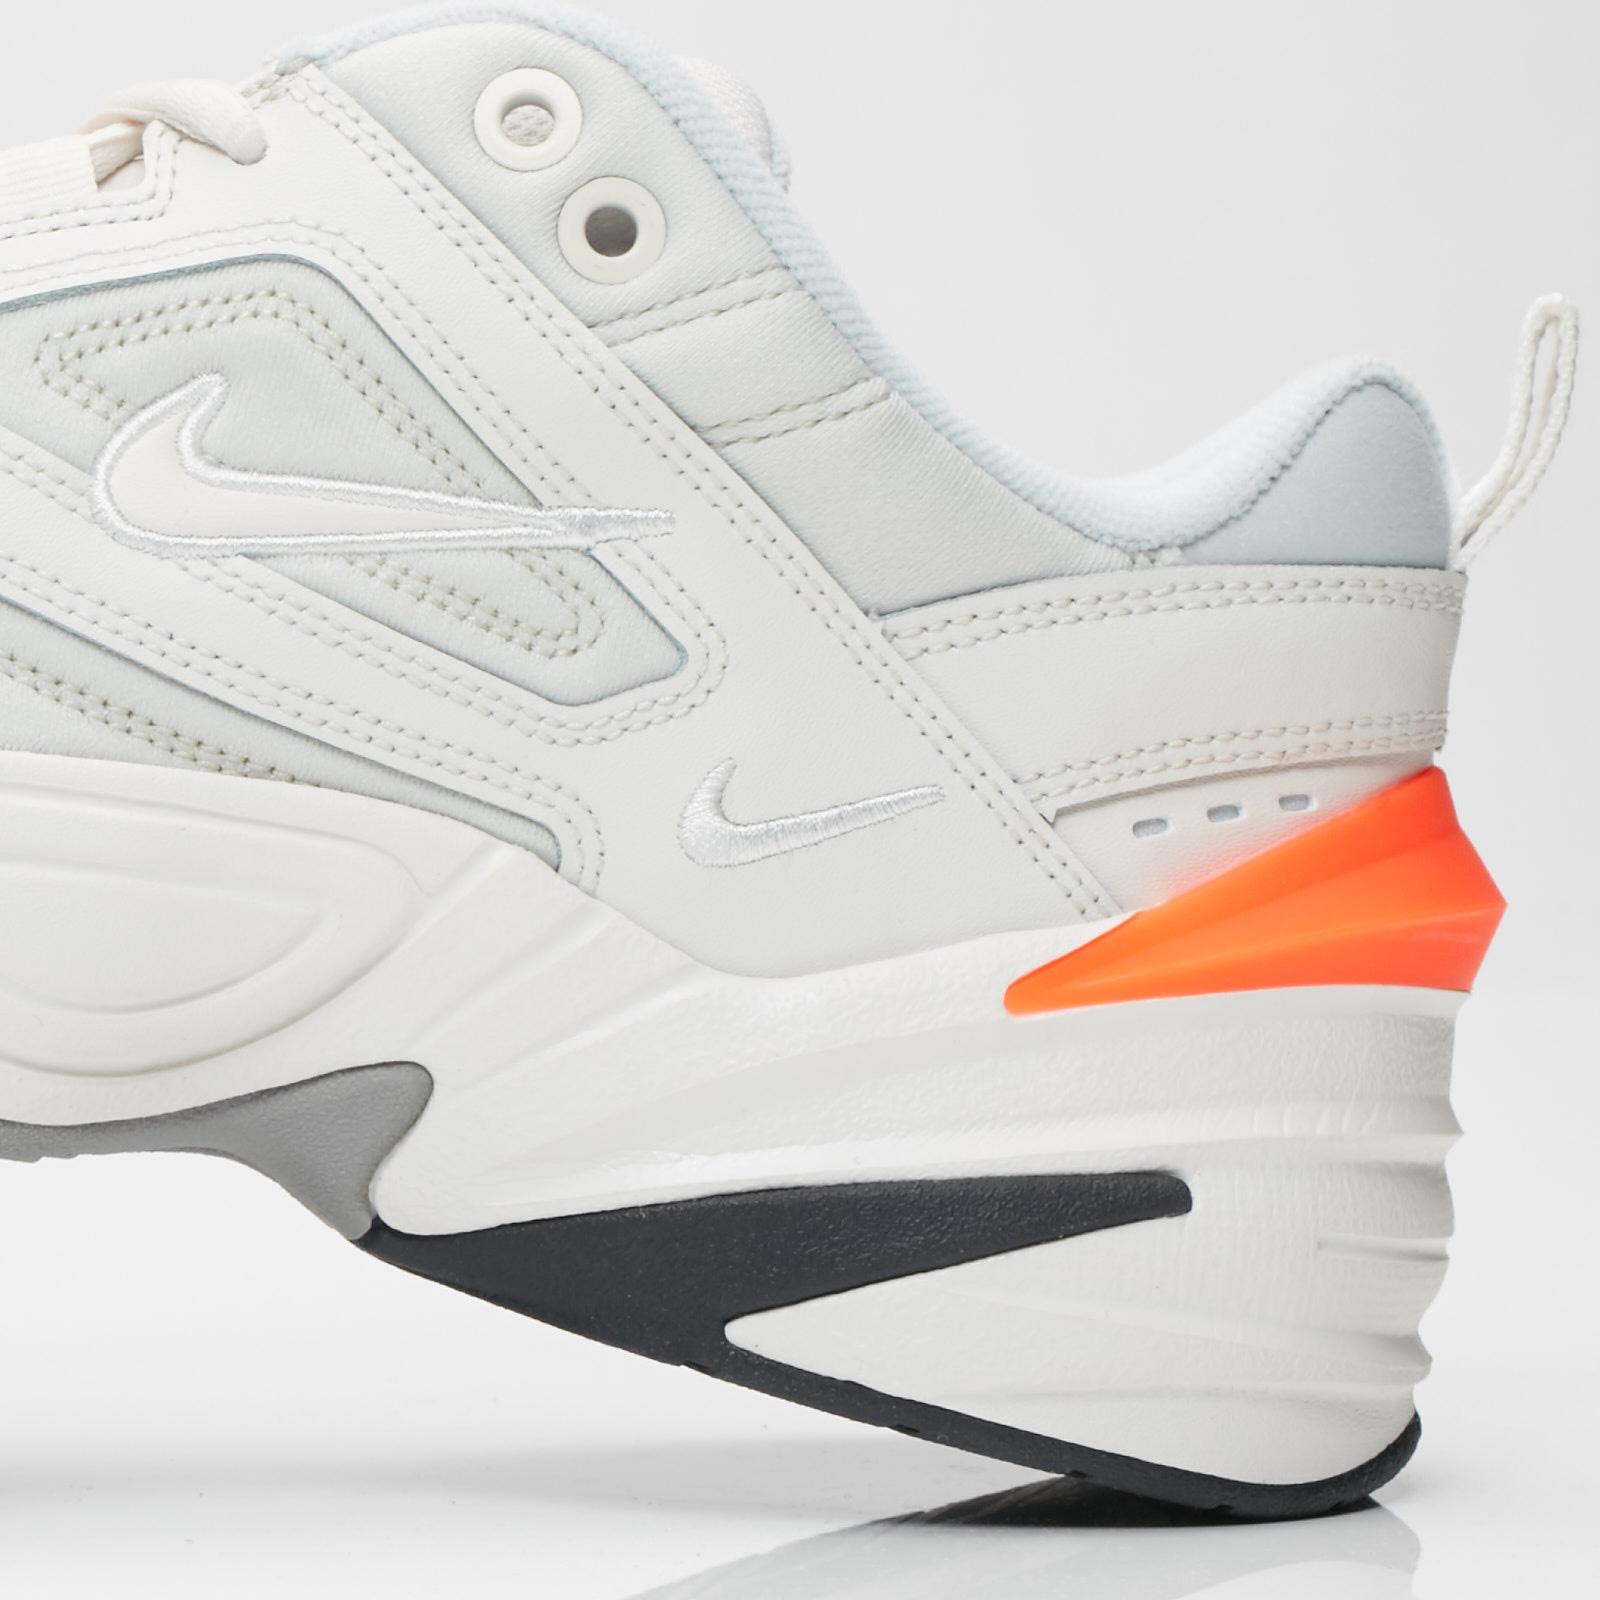 08c05305c Nike Wmns M2K Tekno - Ao3108-001 - Sneakersnstuff